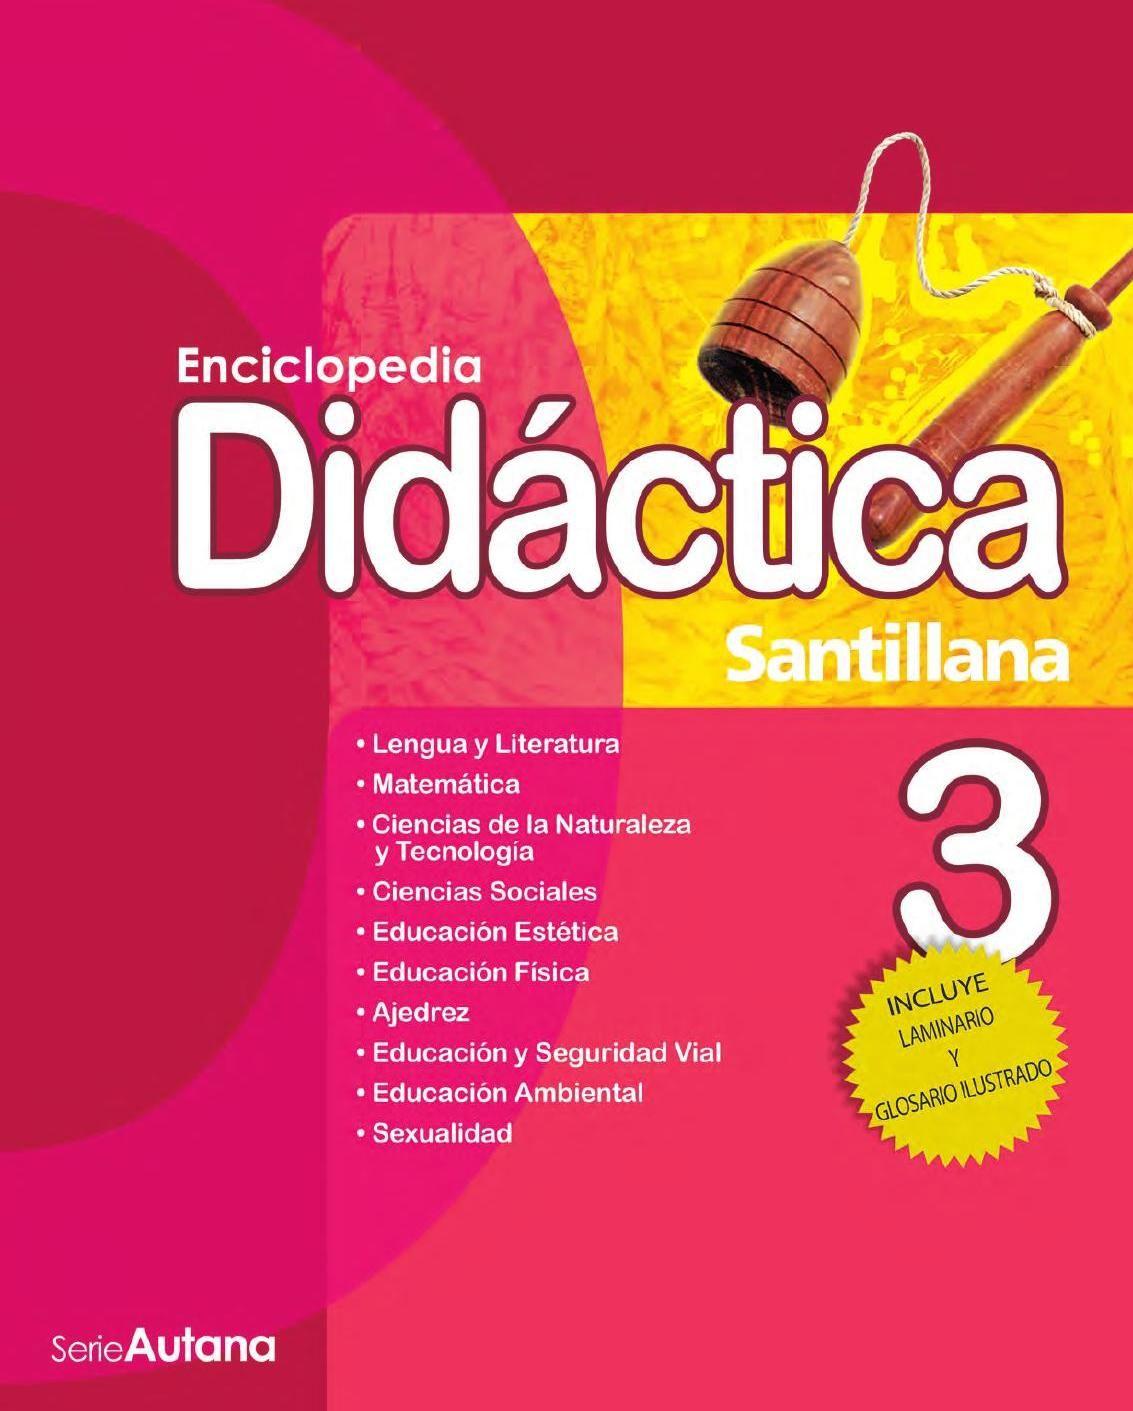 Enciclopedia Didáctica 3 Santillana Education Make It Simple Books